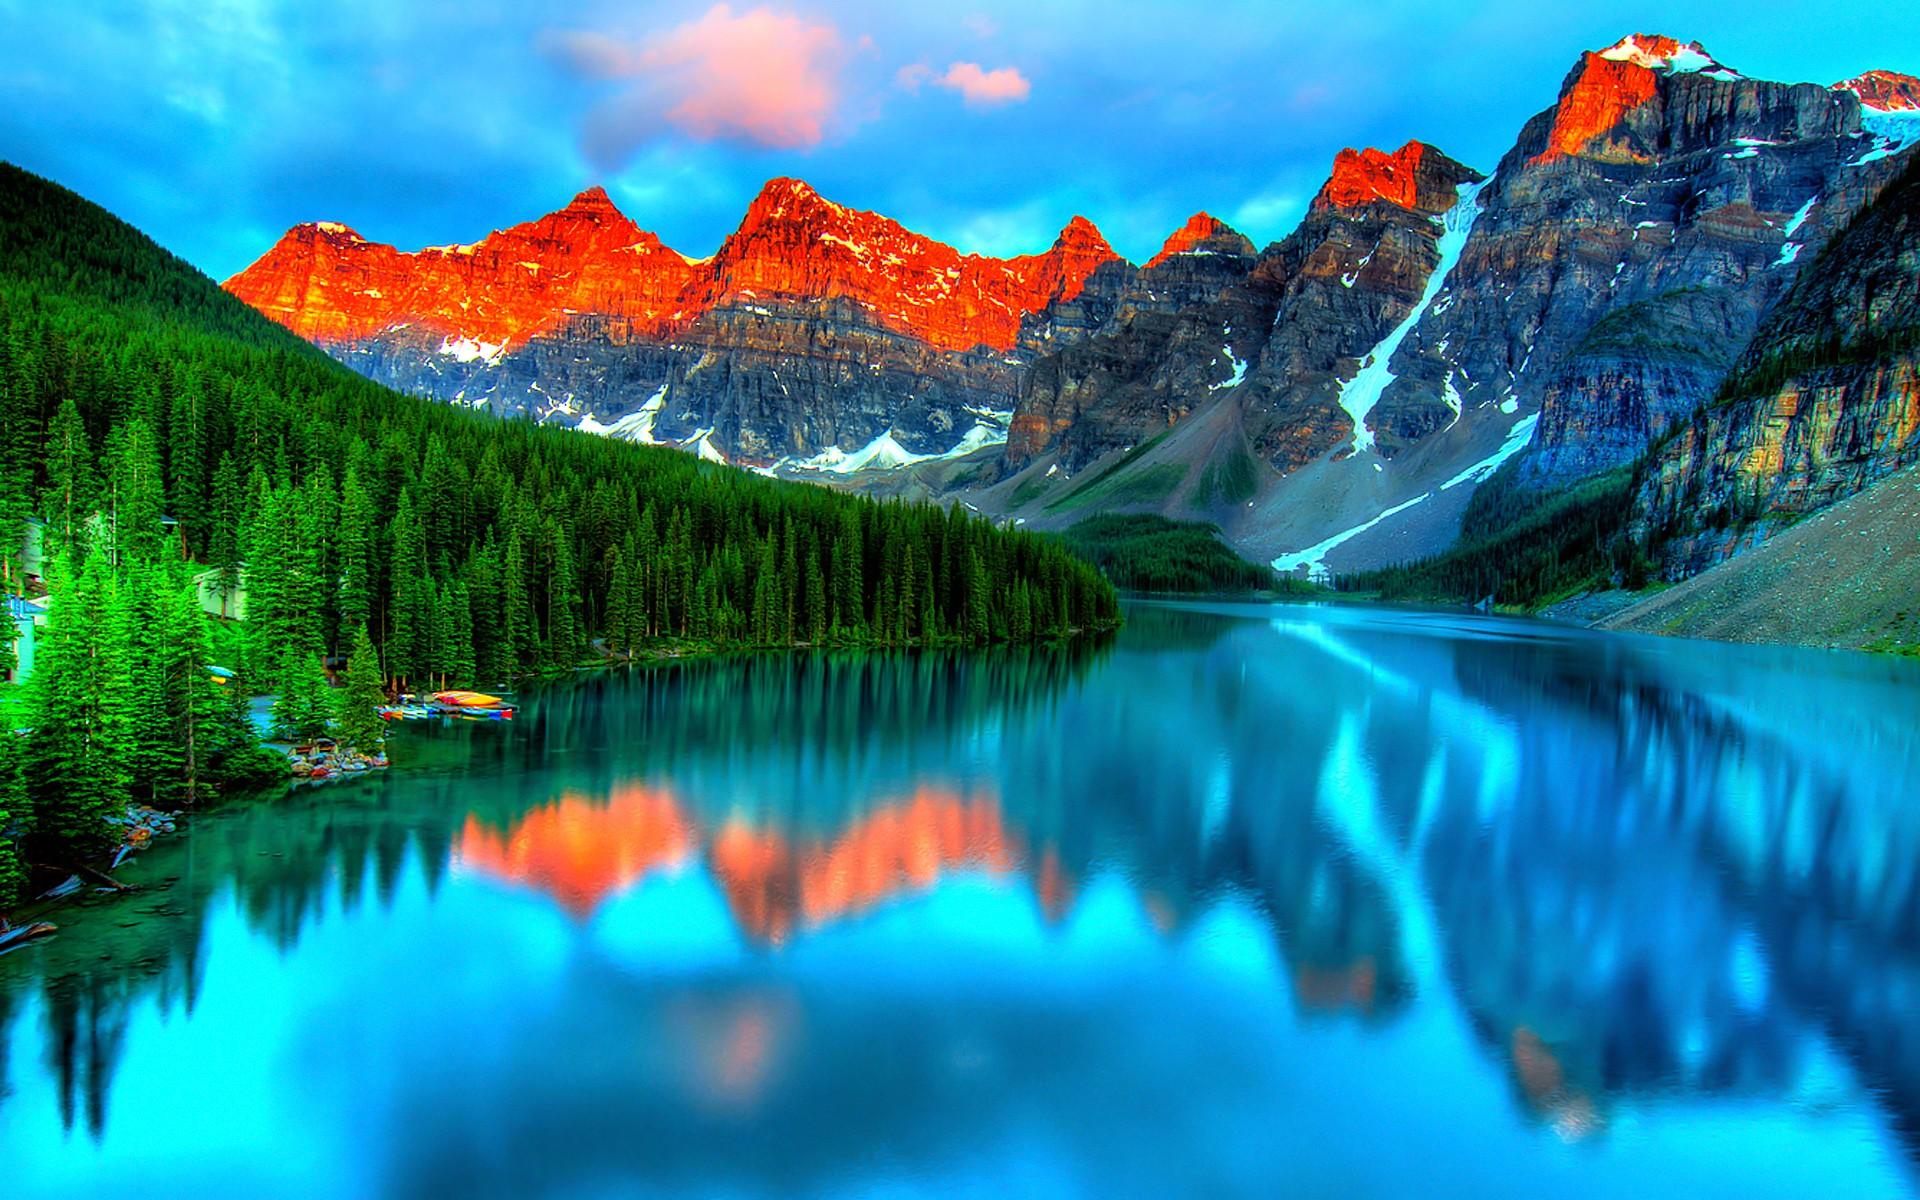 Fall Mountain Lake Wallpaper Free Photo Beautiful Scenery Scenic Scenery Green